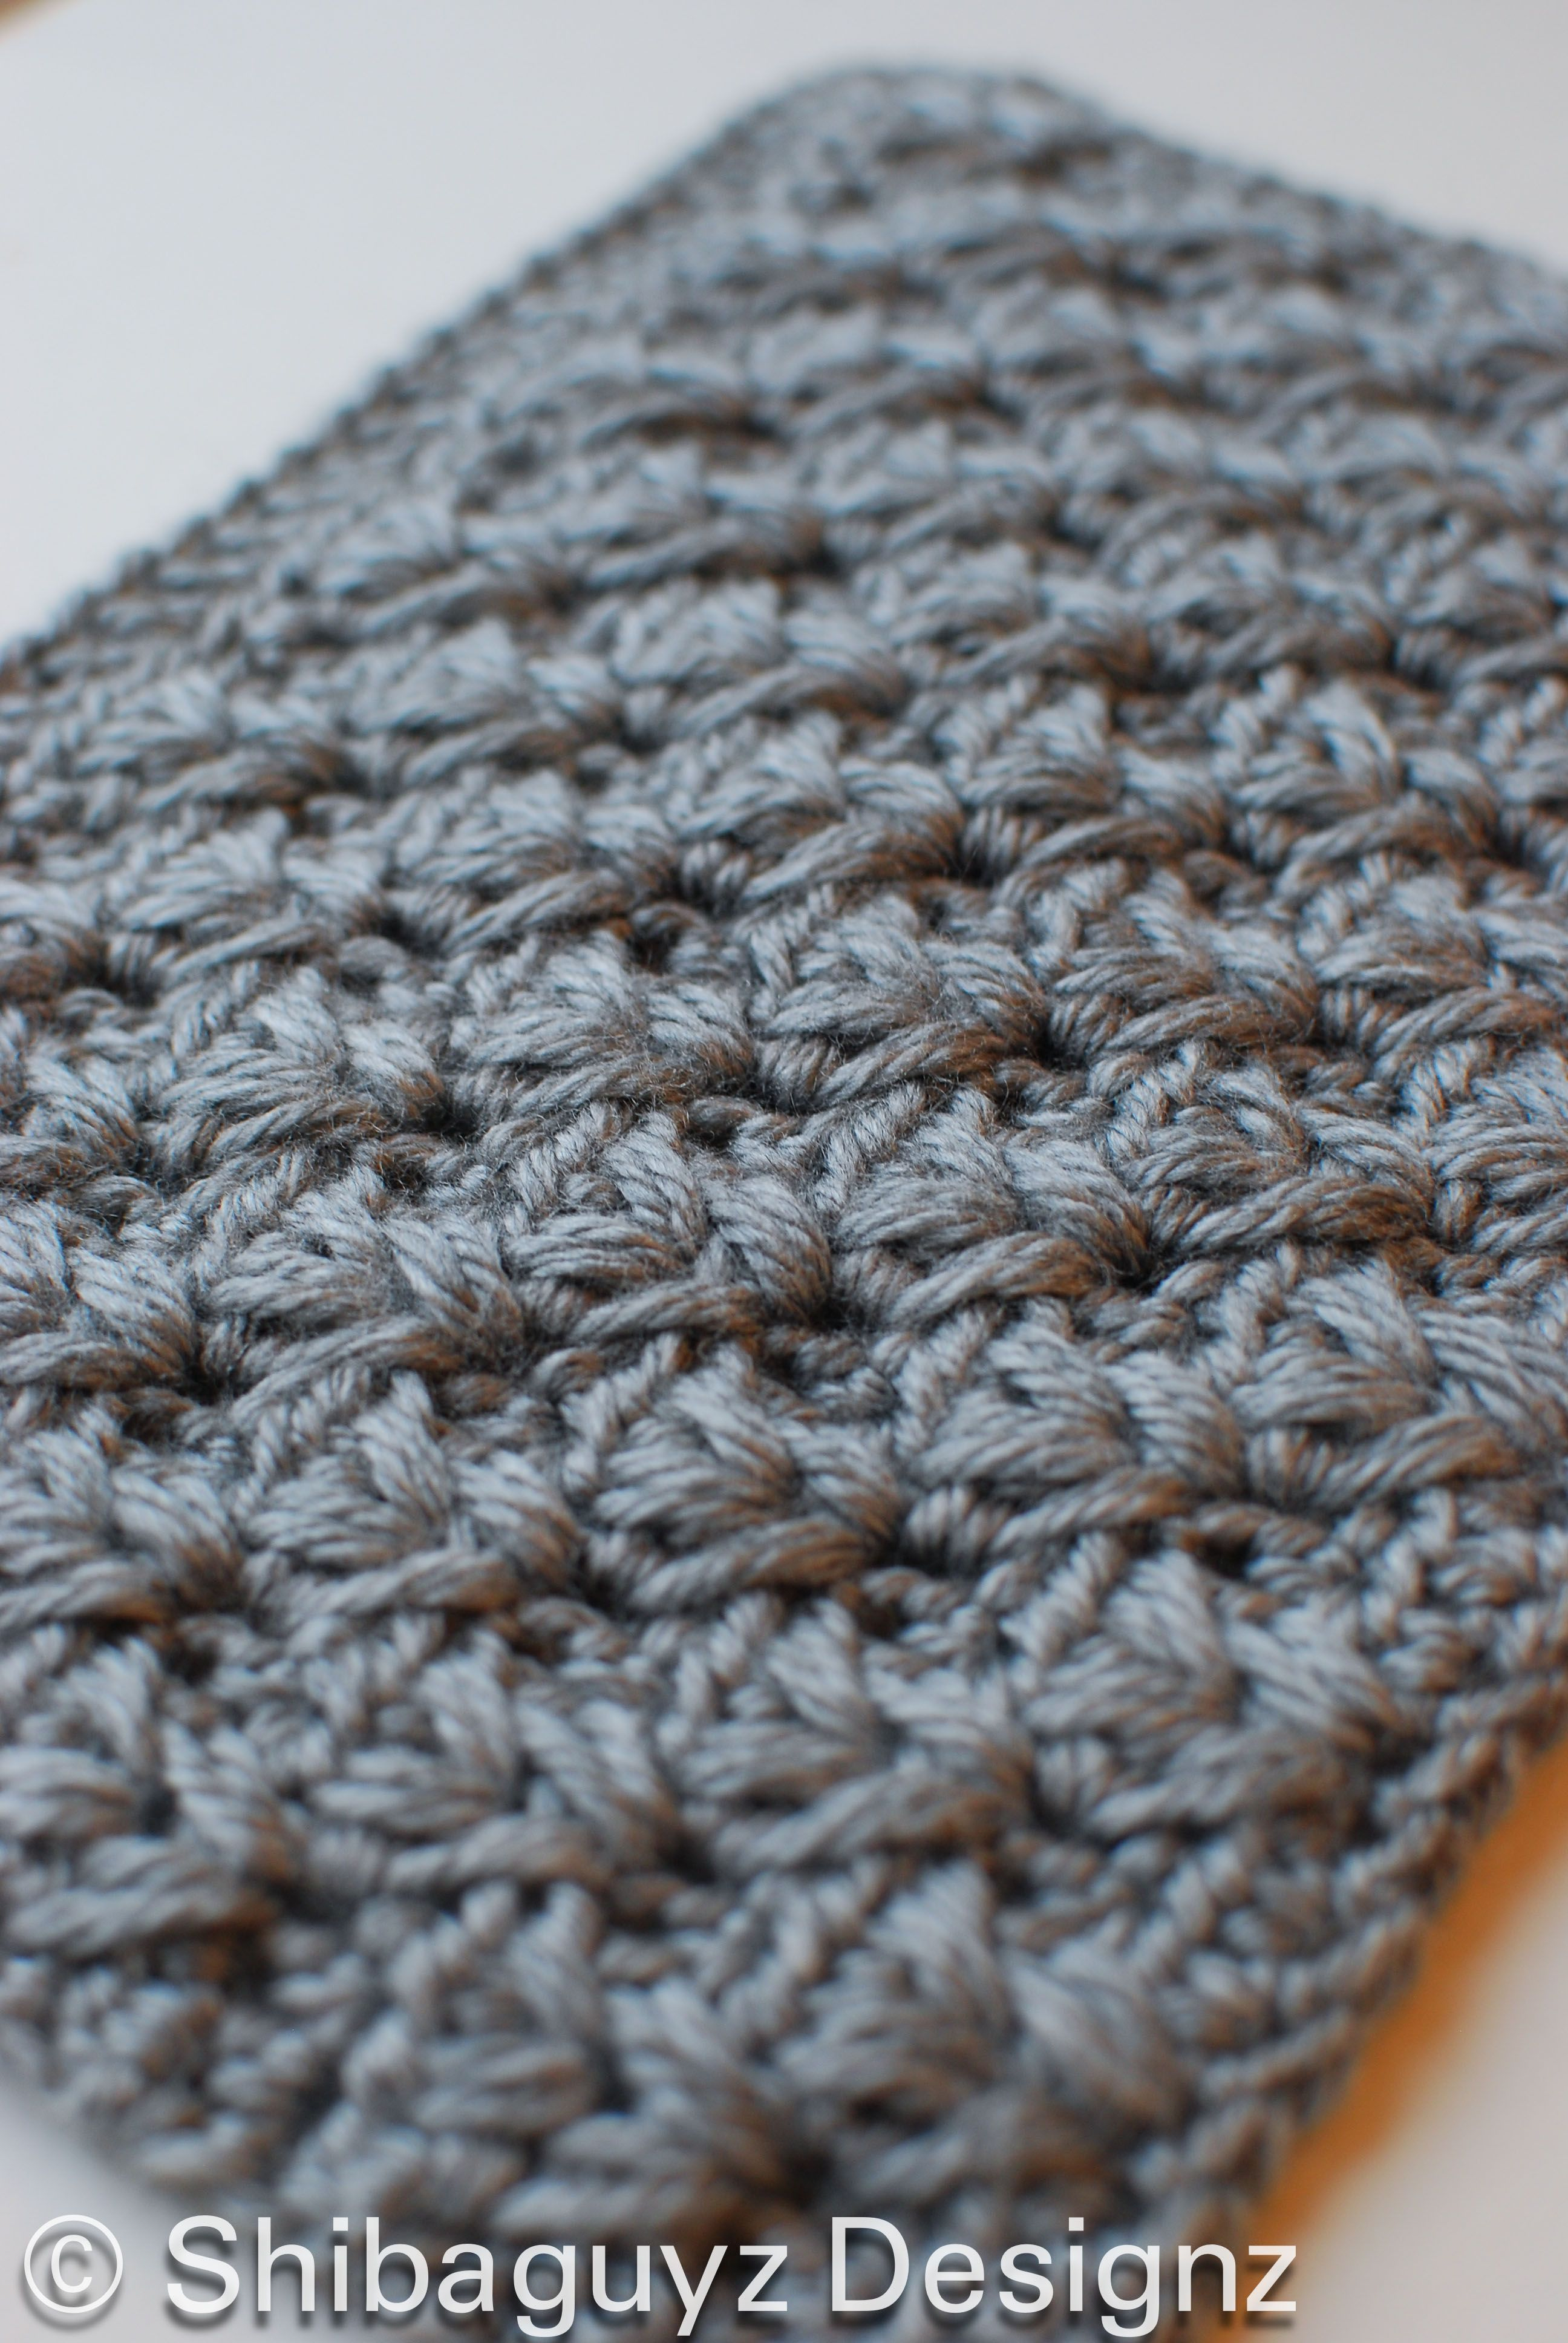 Week 3 Scavenger Hunt Block rom Shibaguyz Designz.  Awesome stitch look.